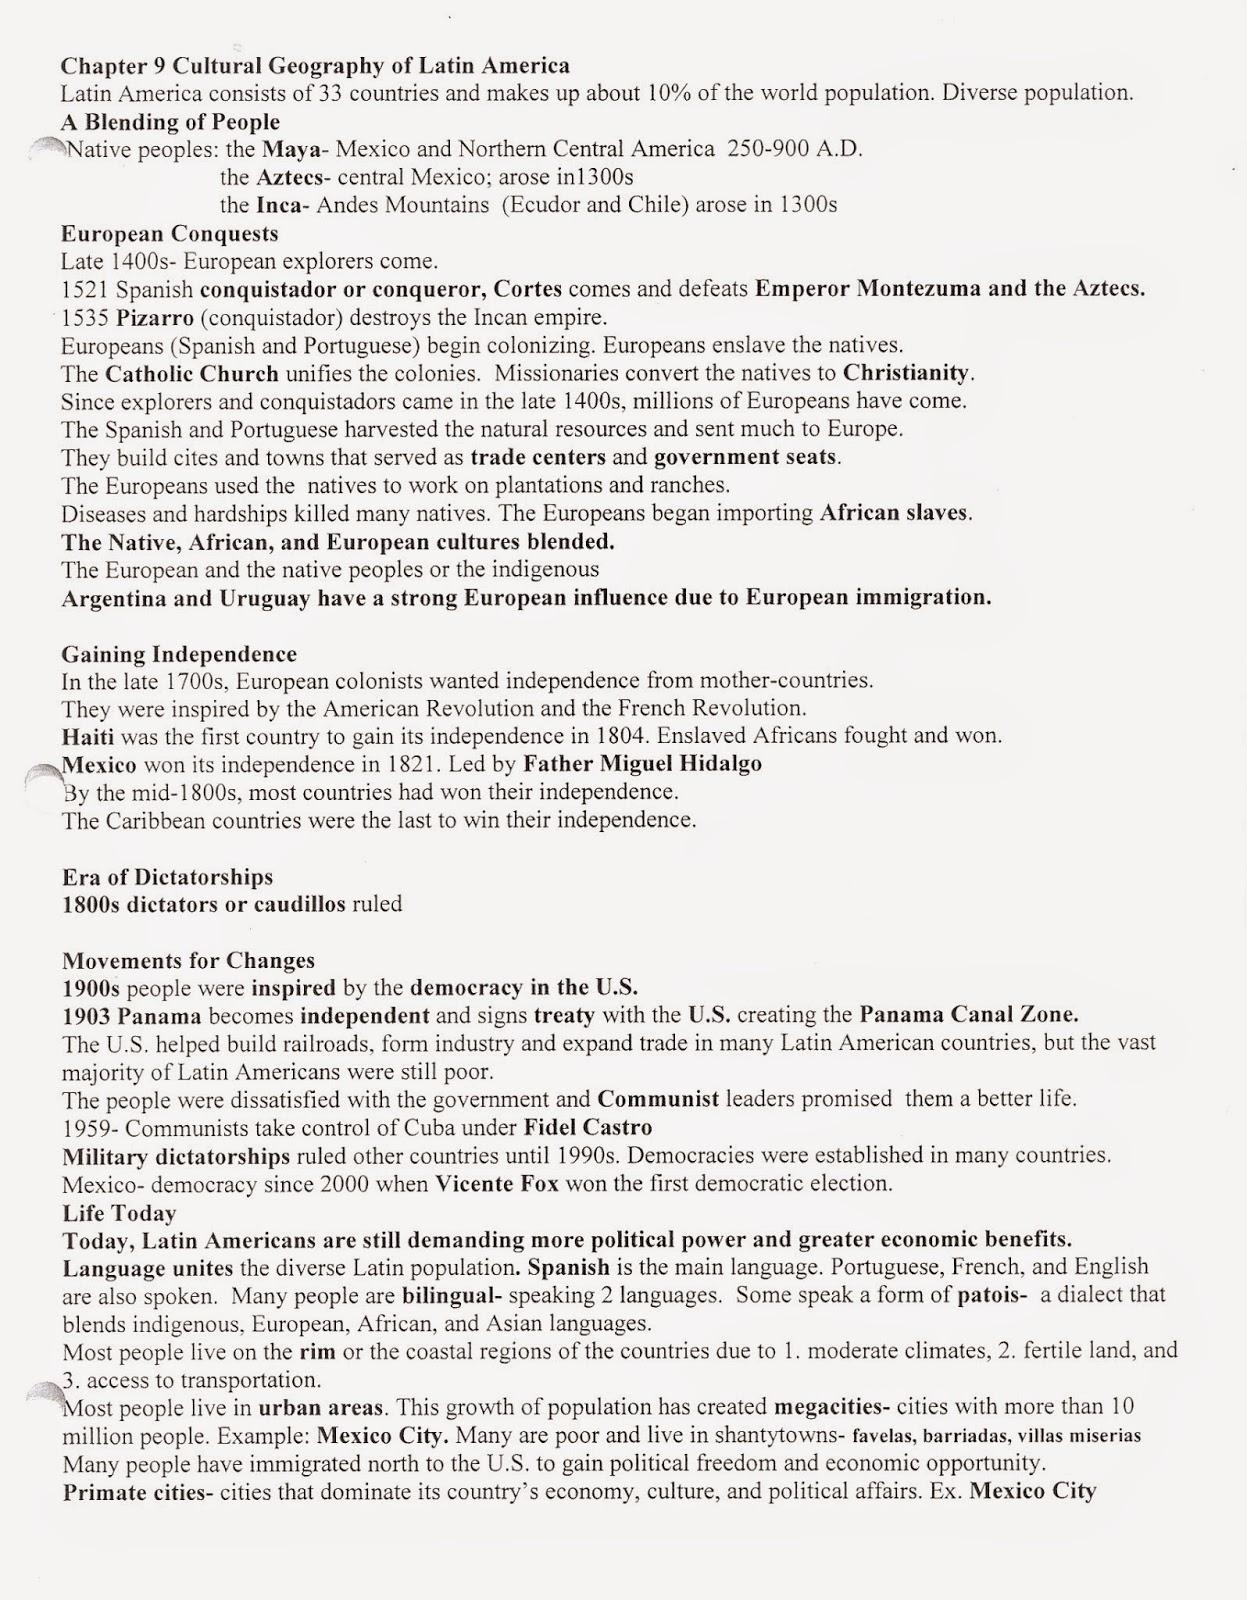 mr e s world geography page world geography chapter 9 the rh acewg blogspot com Rich Dollaz vs Tech 9 Ch 9 Syracuse NY